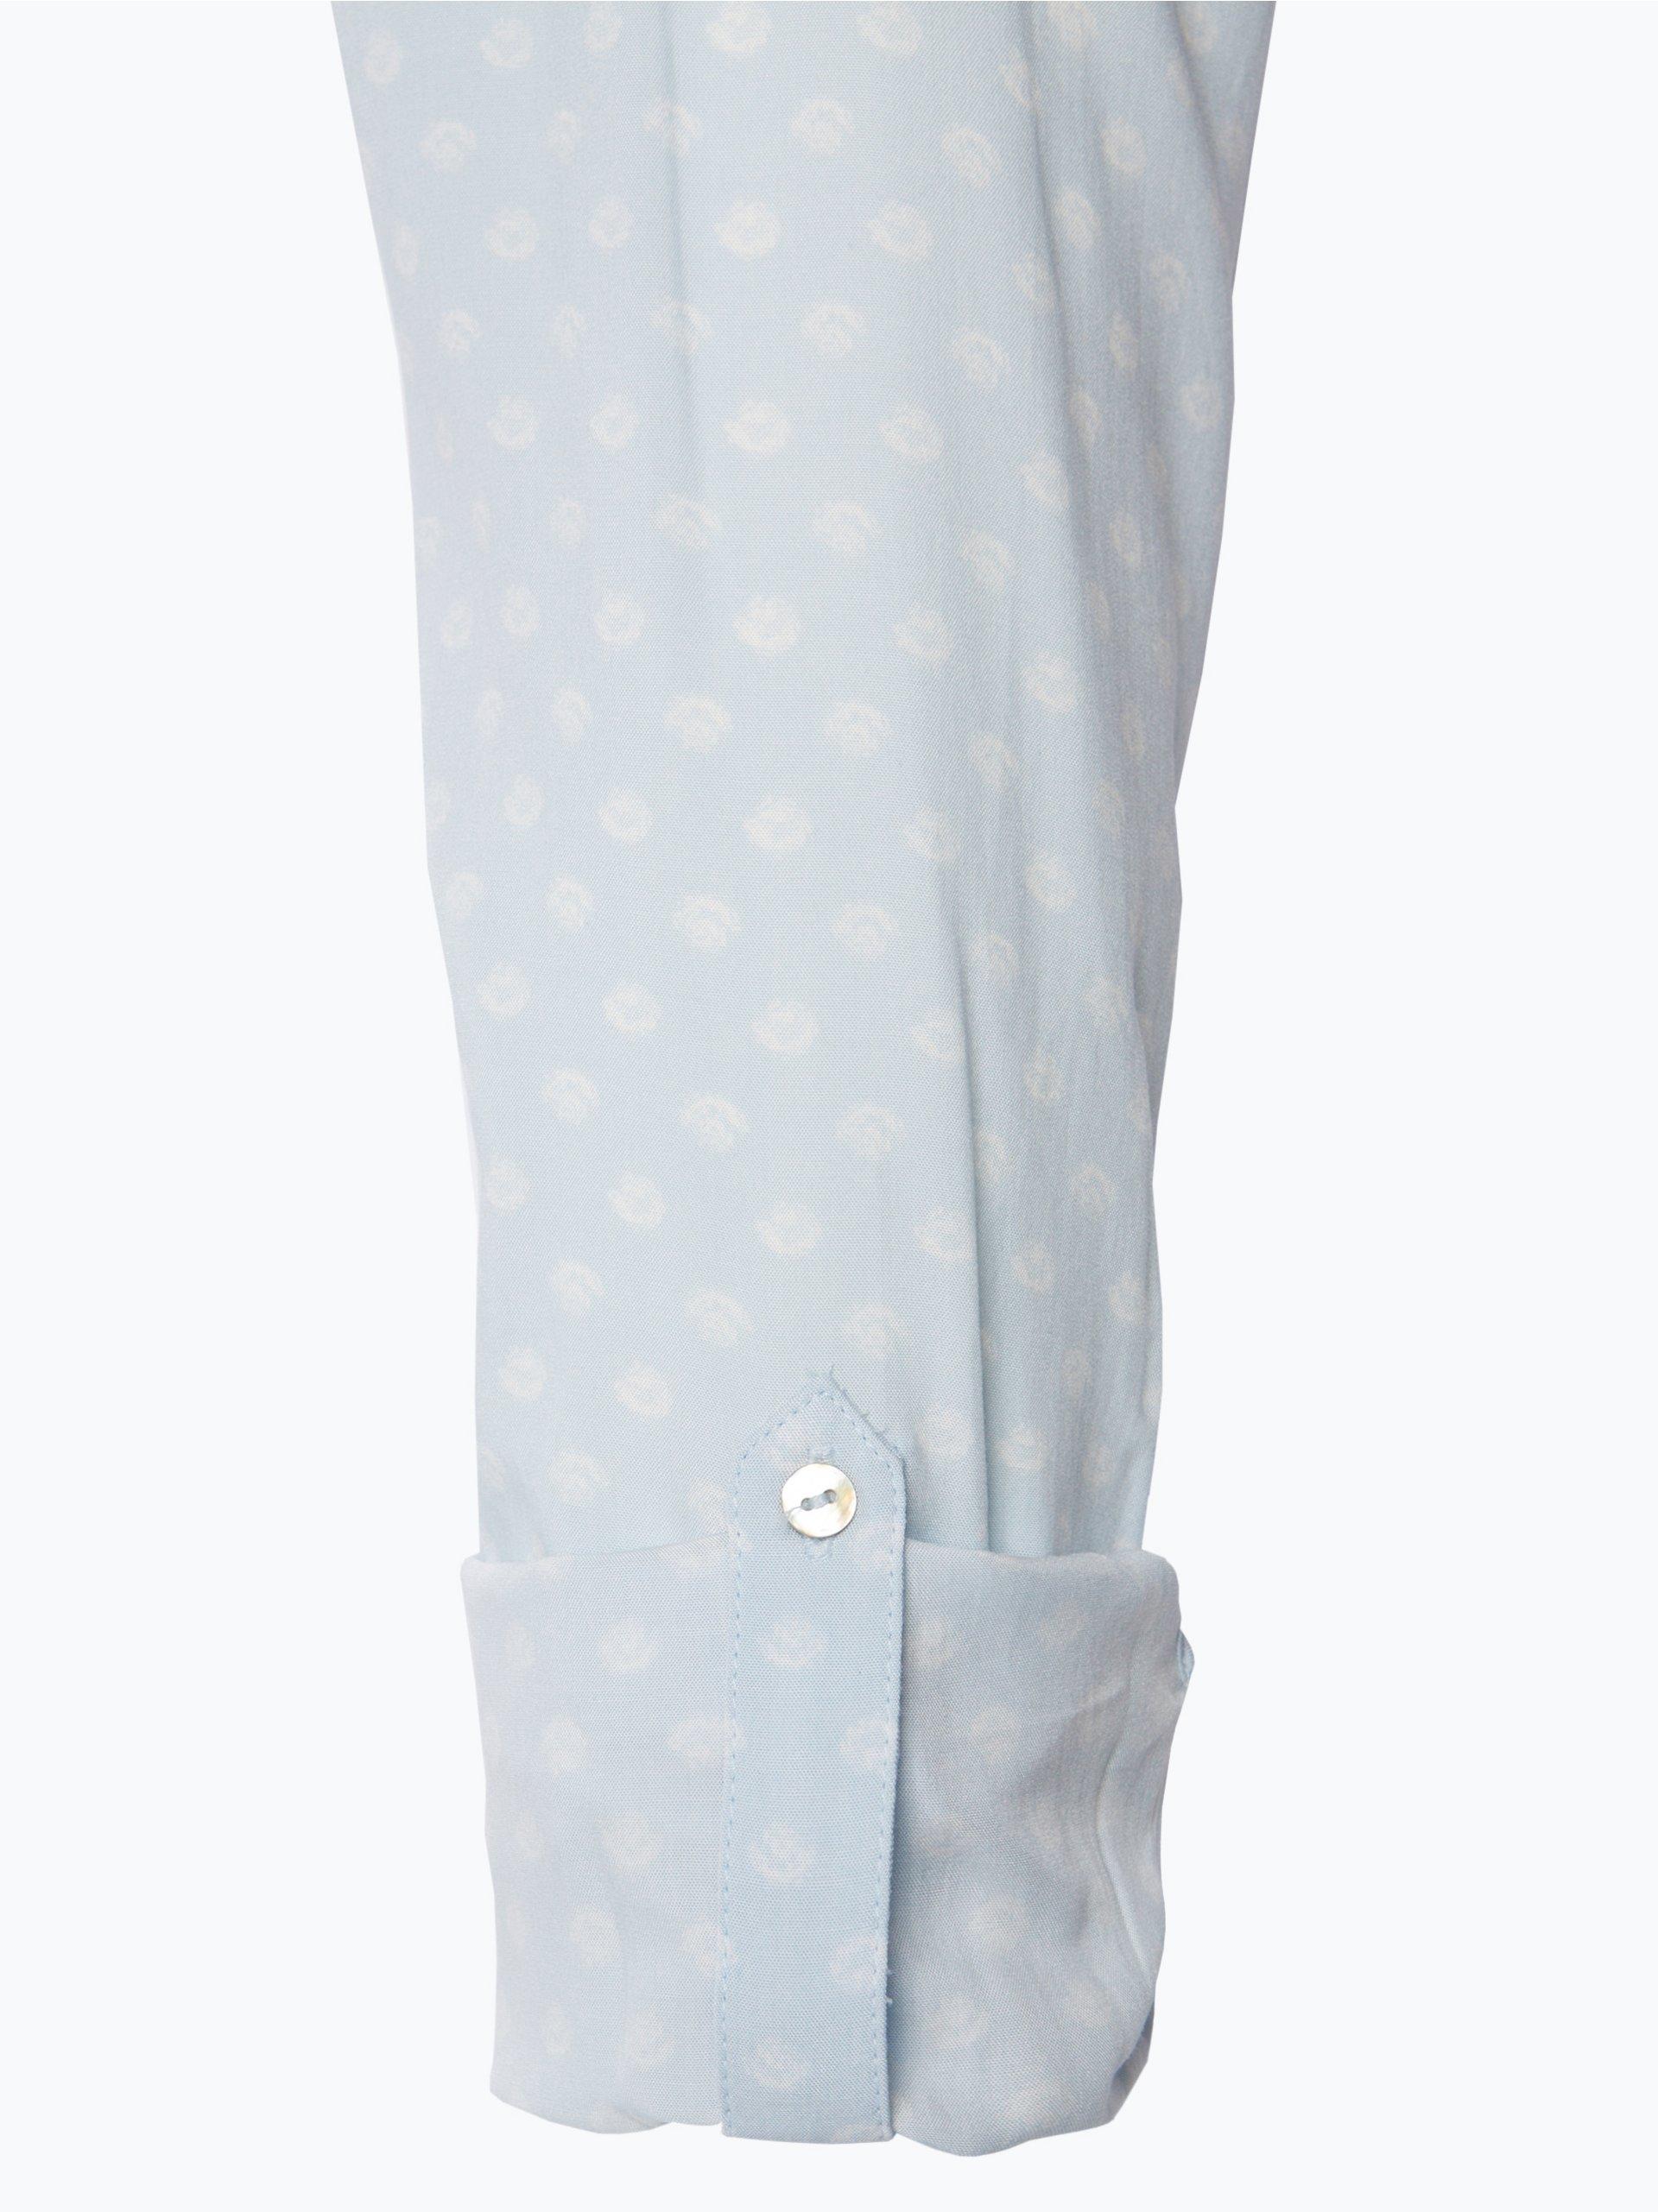 esprit casual damen bluse hellblau gepunktet online kaufen vangraaf com. Black Bedroom Furniture Sets. Home Design Ideas